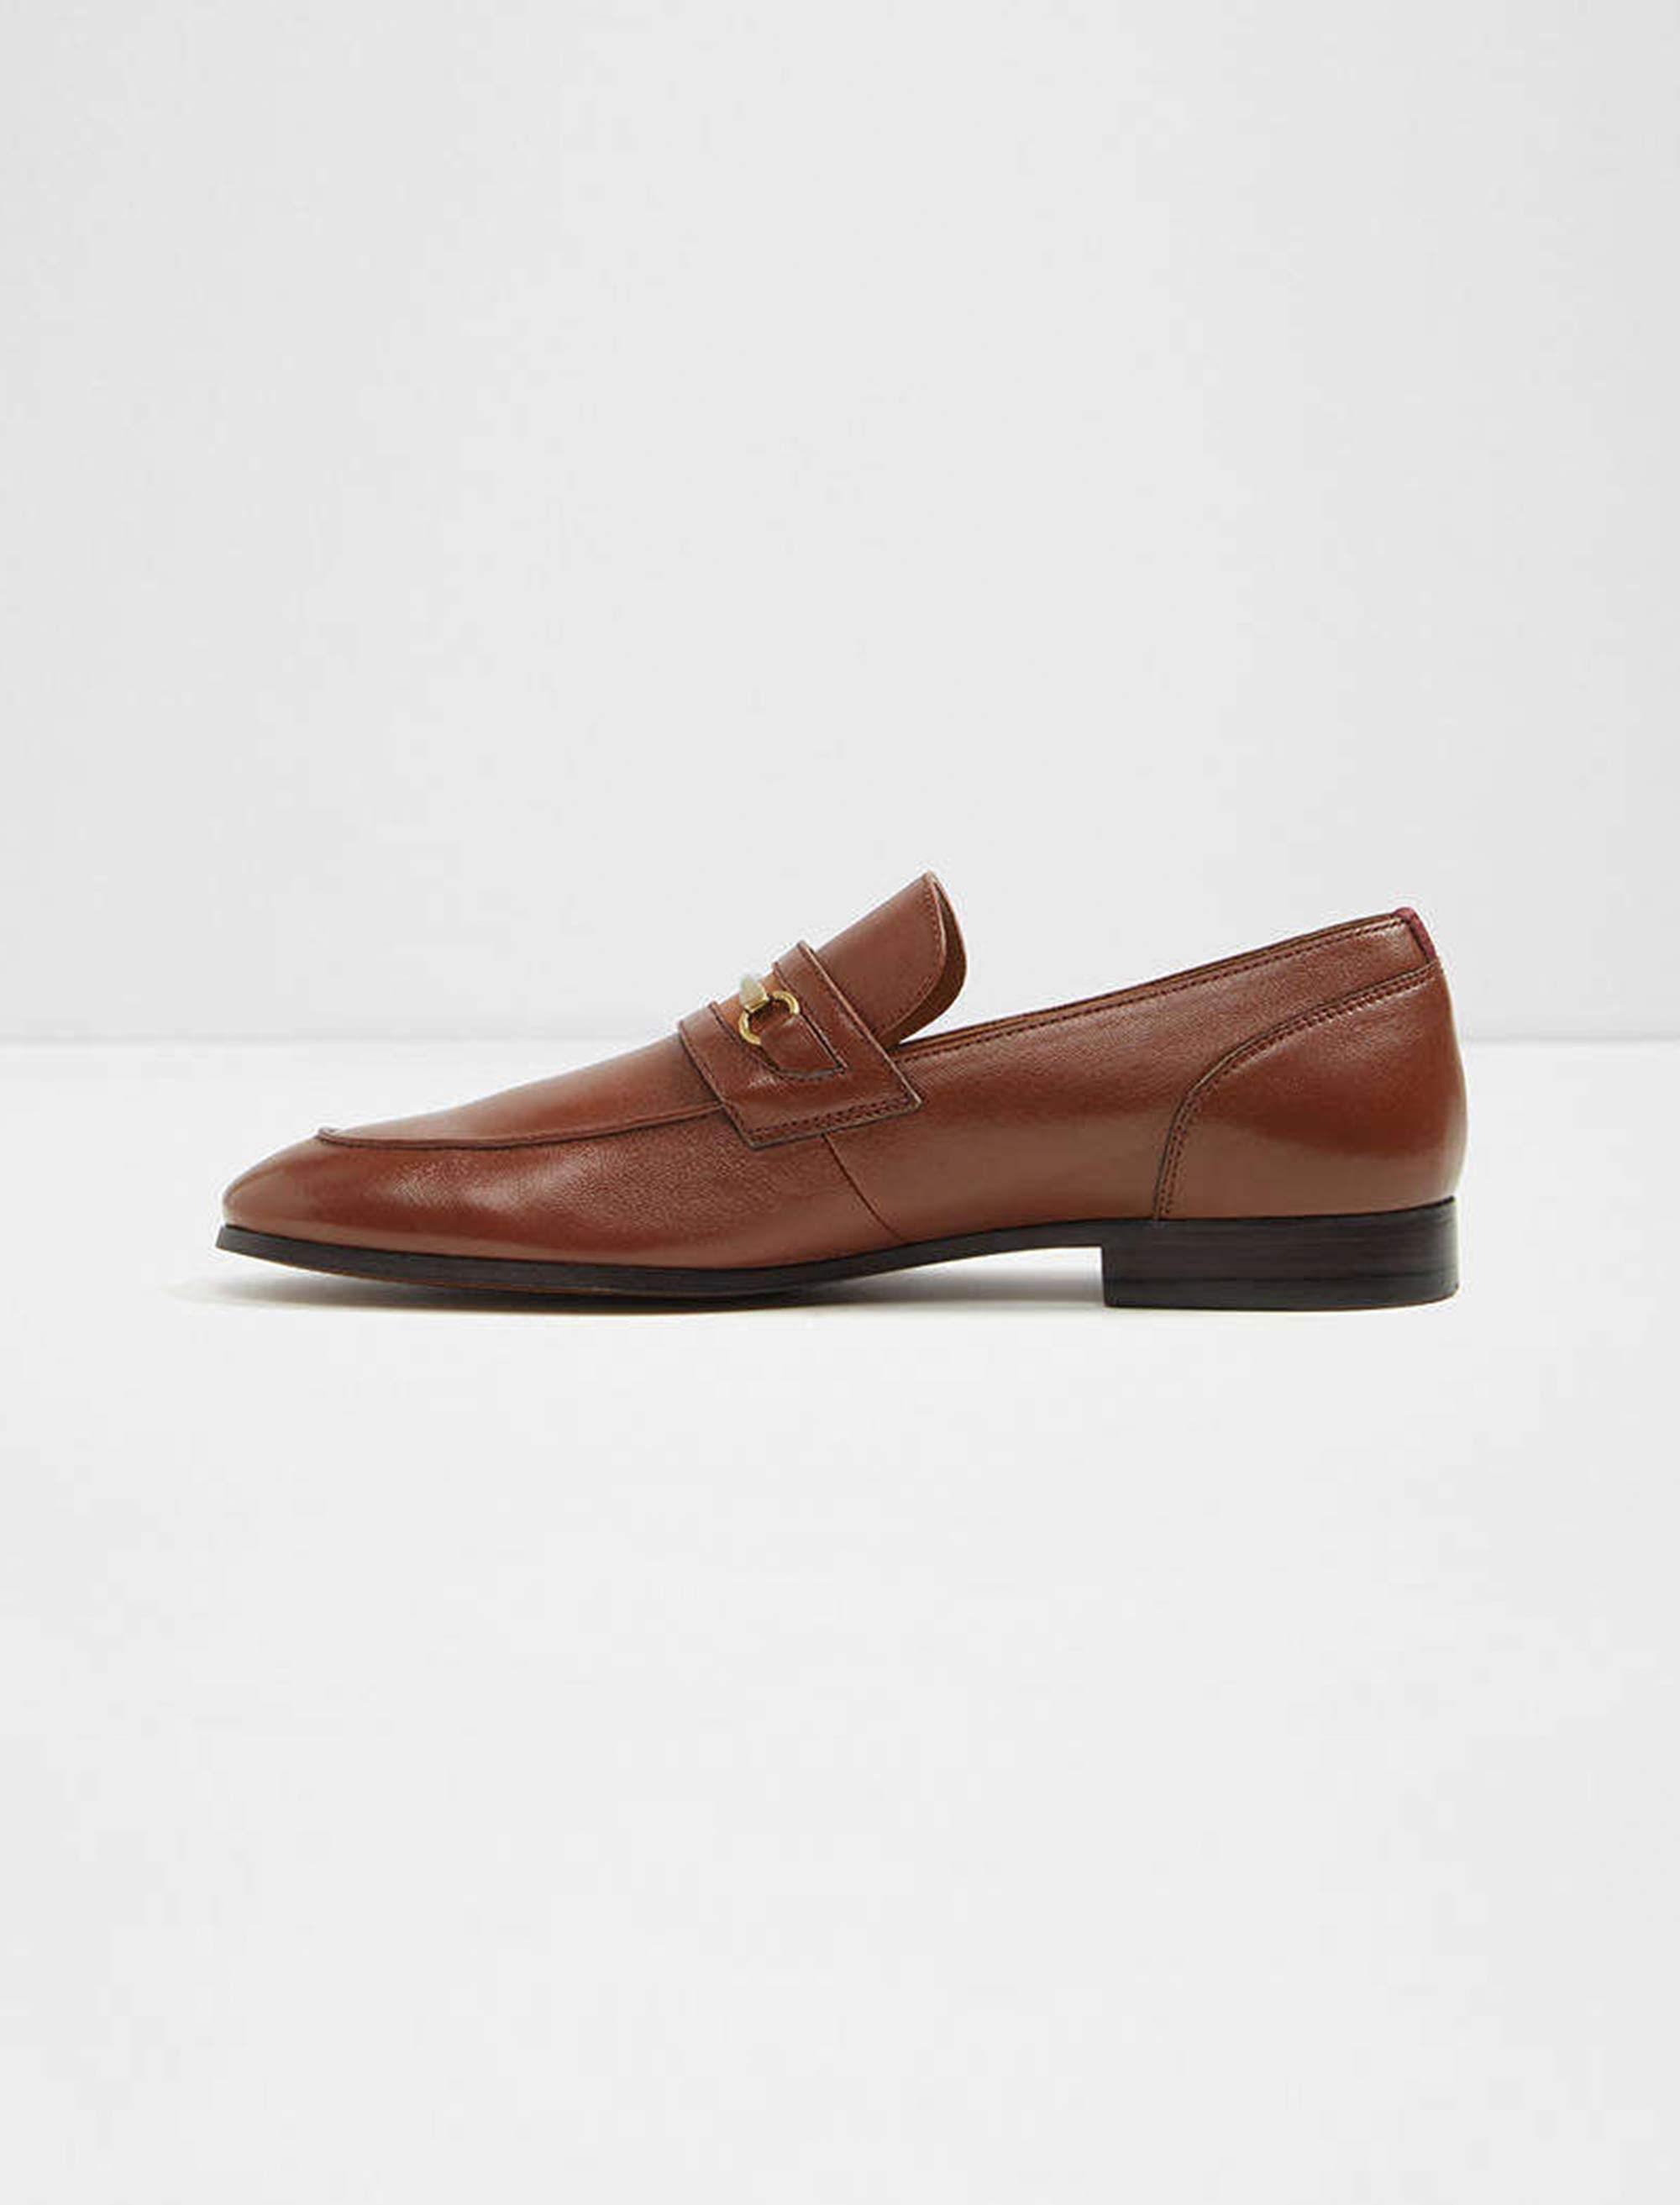 کفش اداری چرم مردانه - قهوه اي - 2